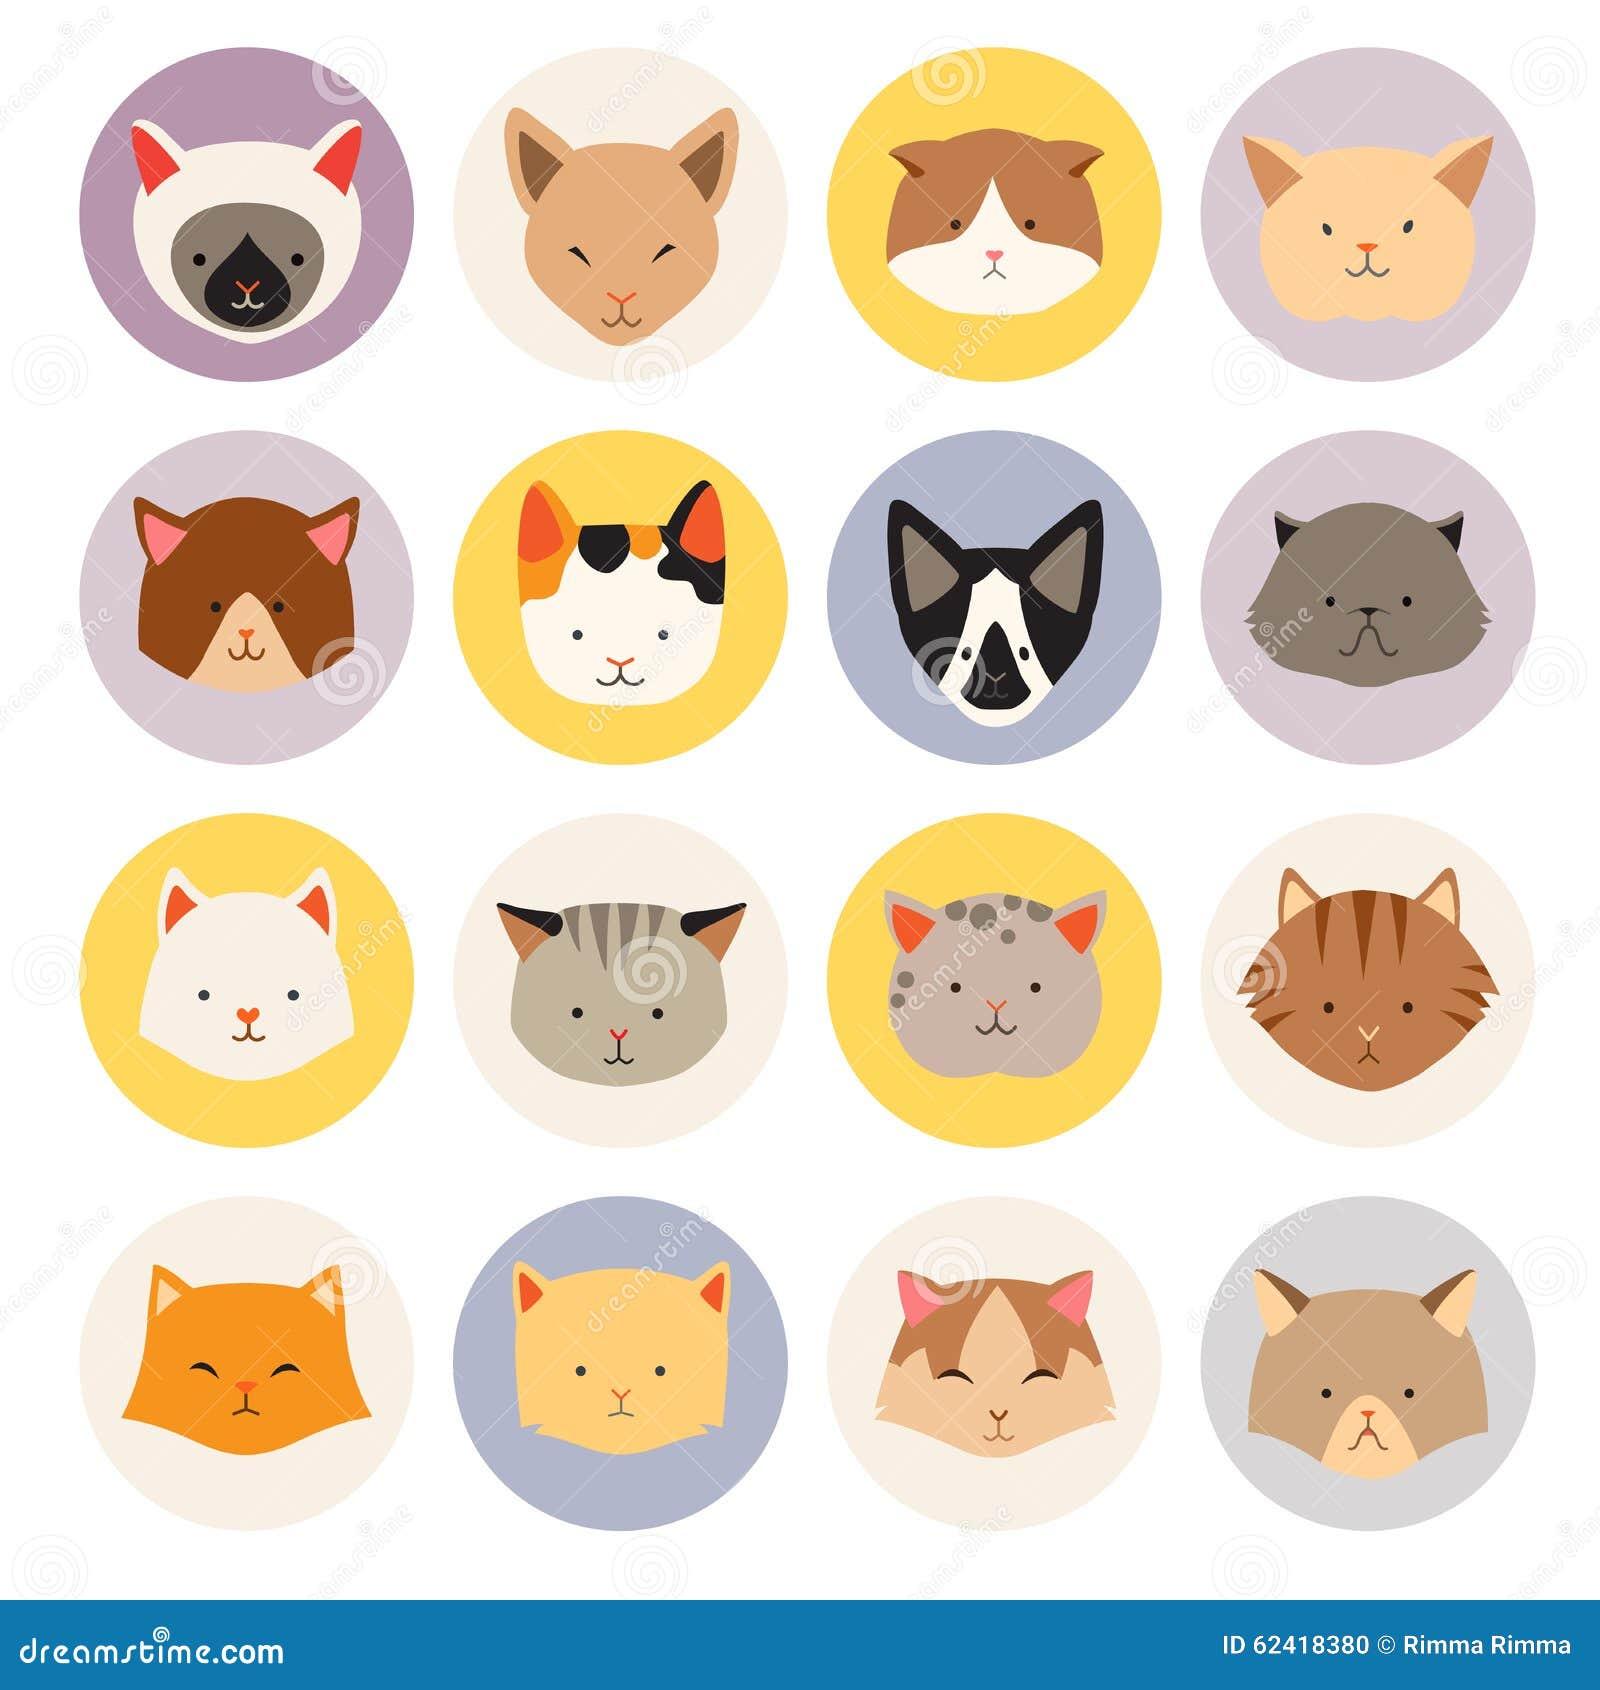 cats in egyptian mythology